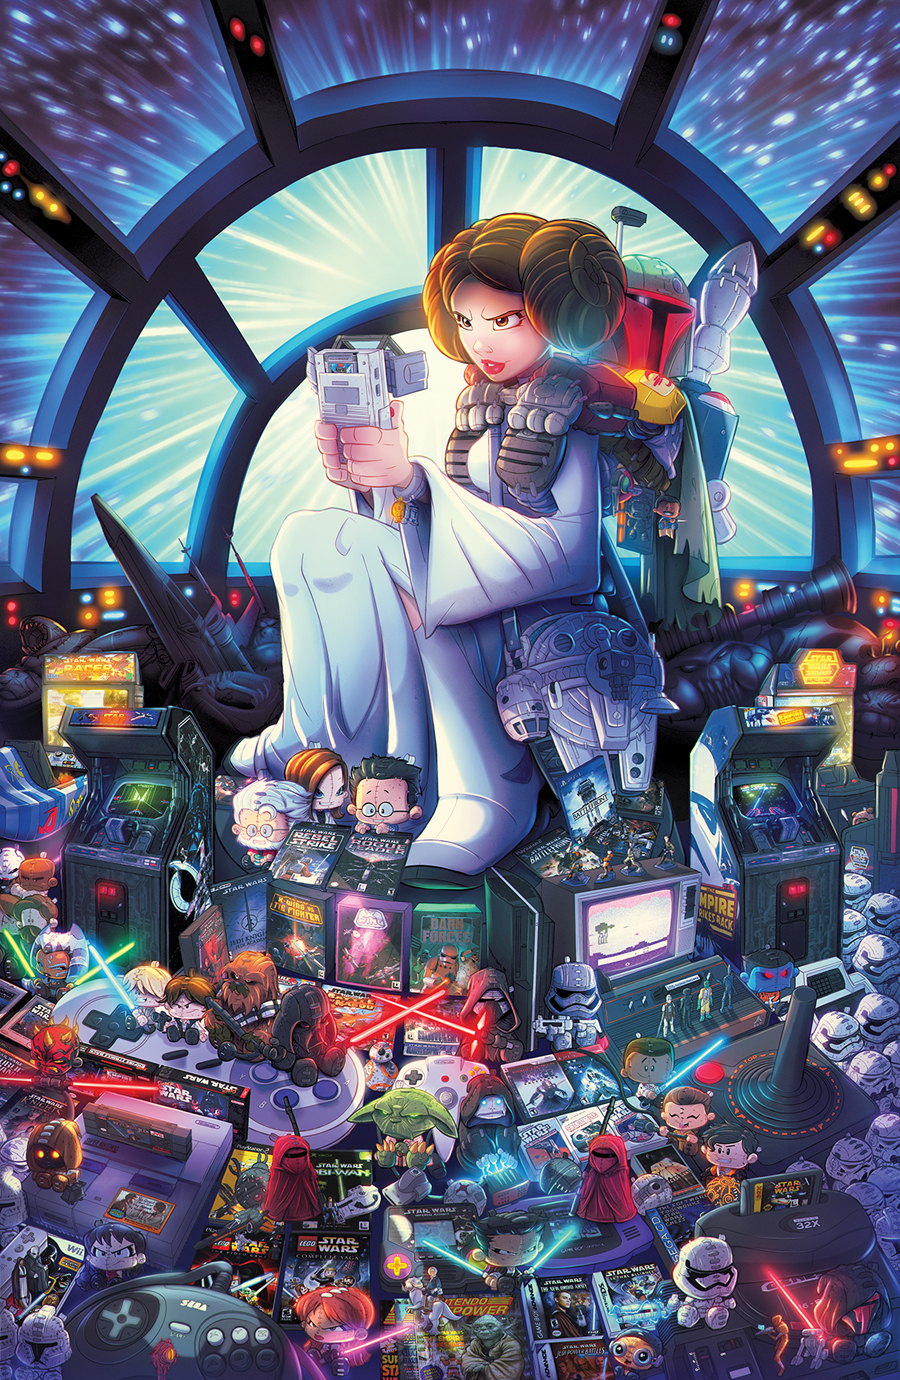 Star Wars Gaming Tribute by RobDuenas